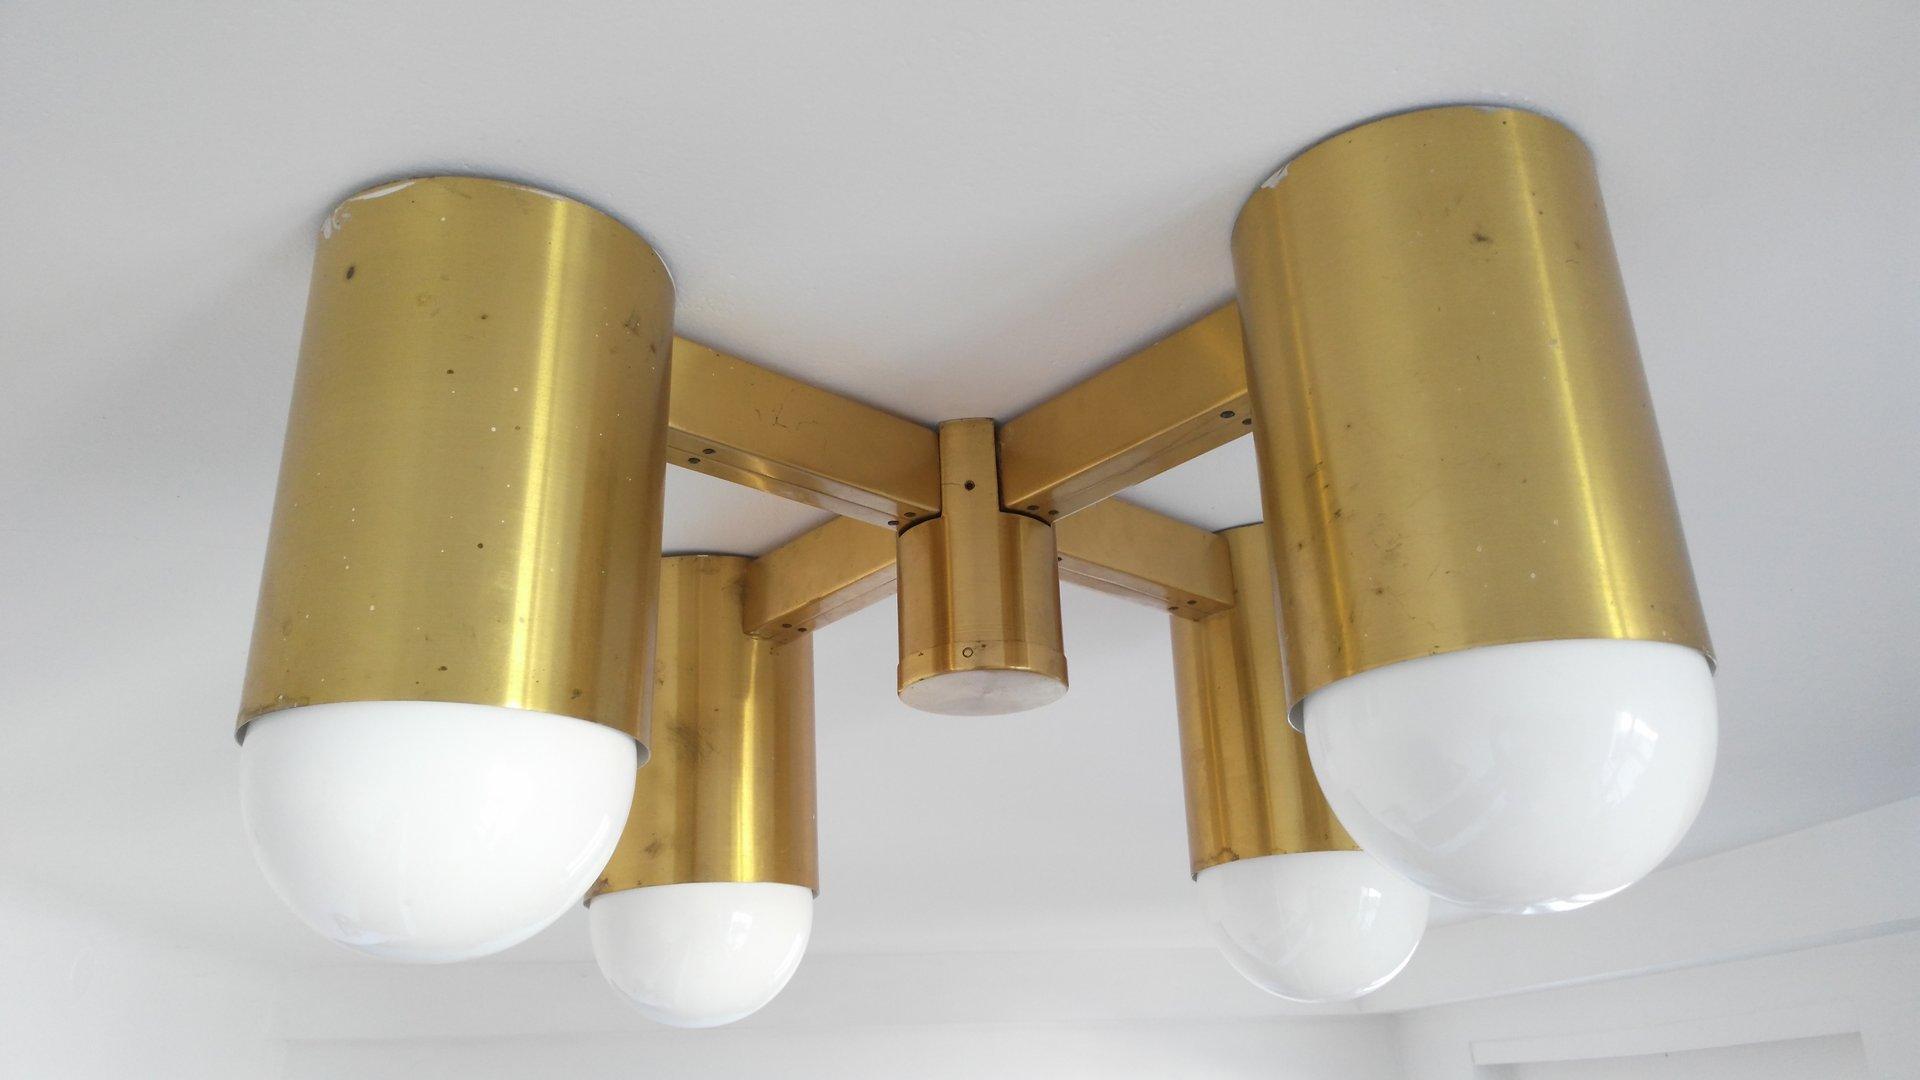 Große industrielle Vintage Deckenlampe aus Messing, 1970er